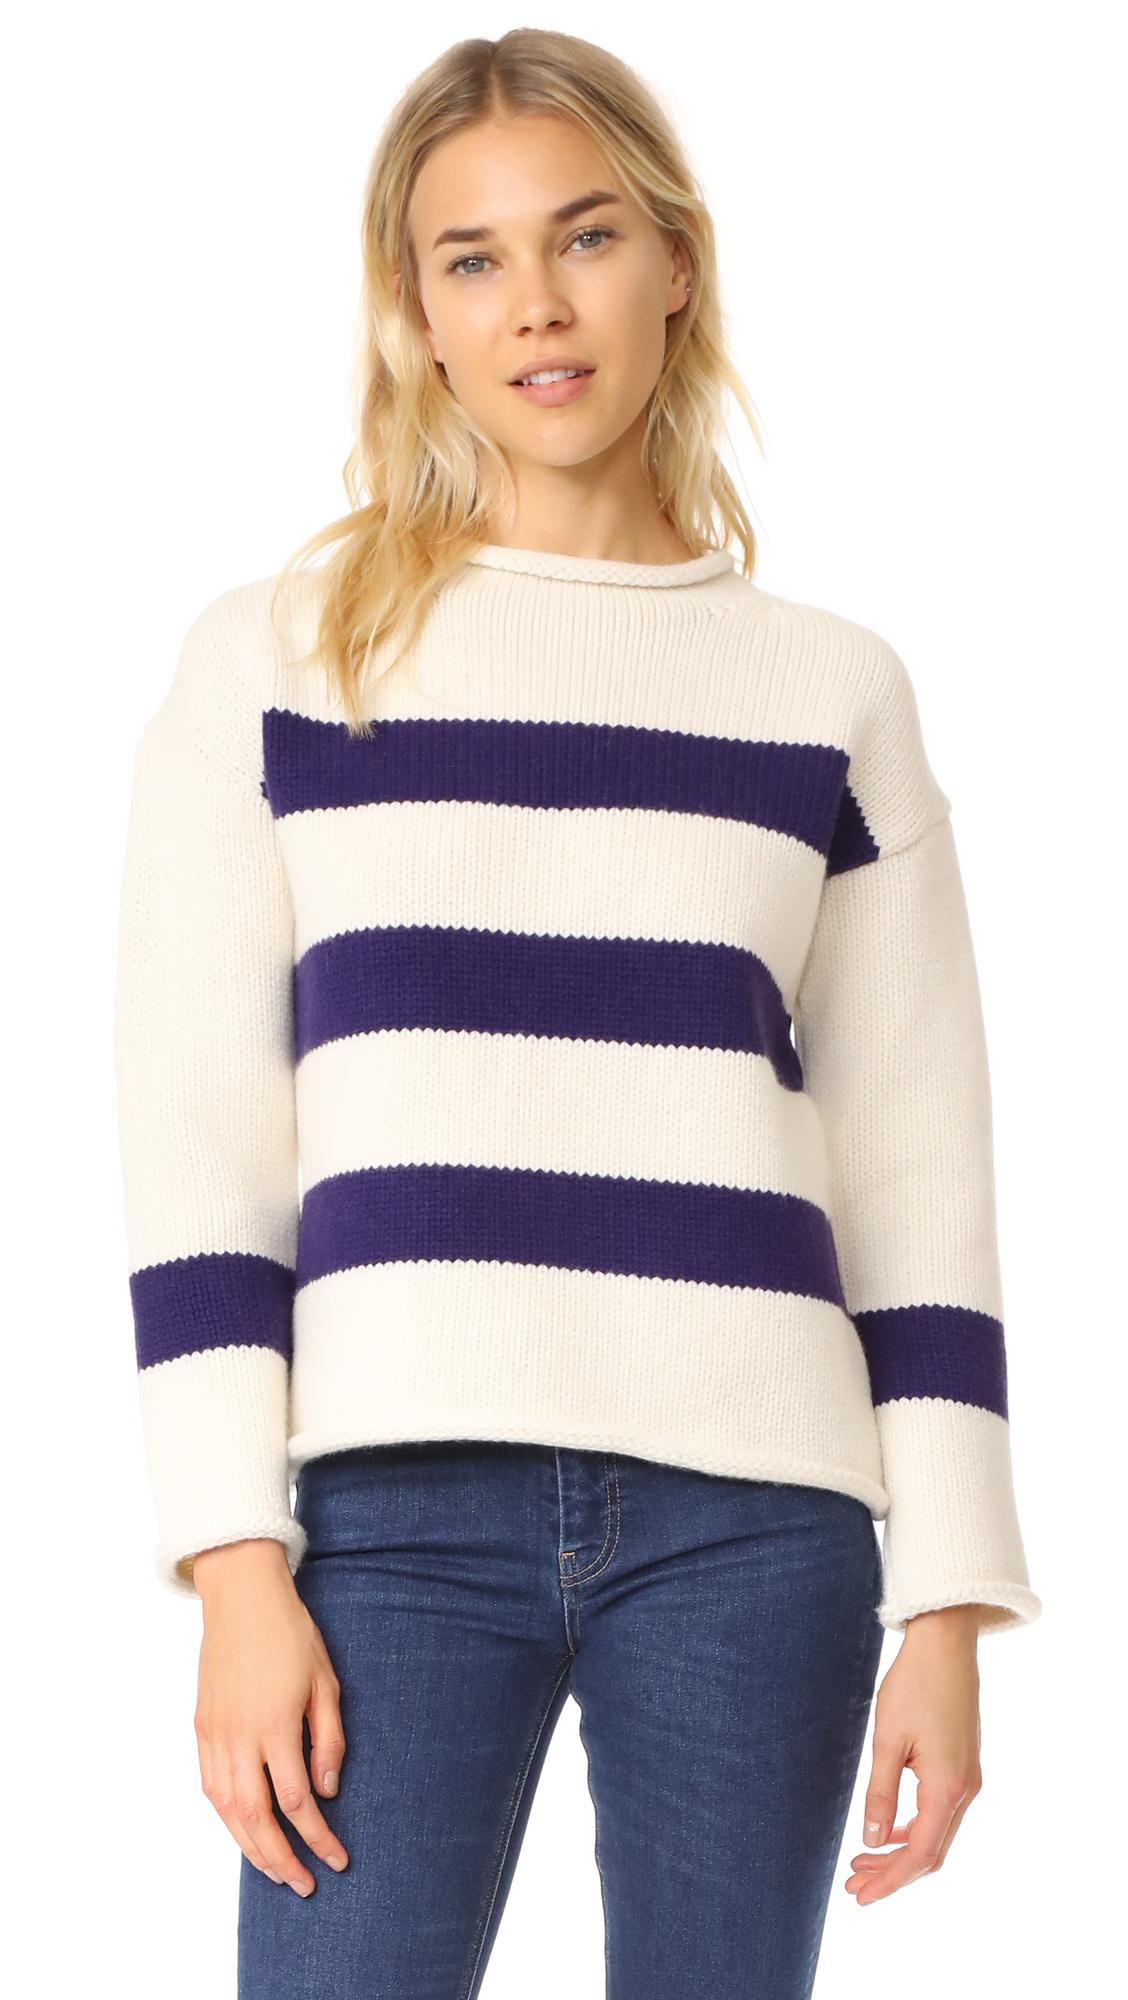 M.i.h Jeans Yardley Sweater - Buttermilk/Grape